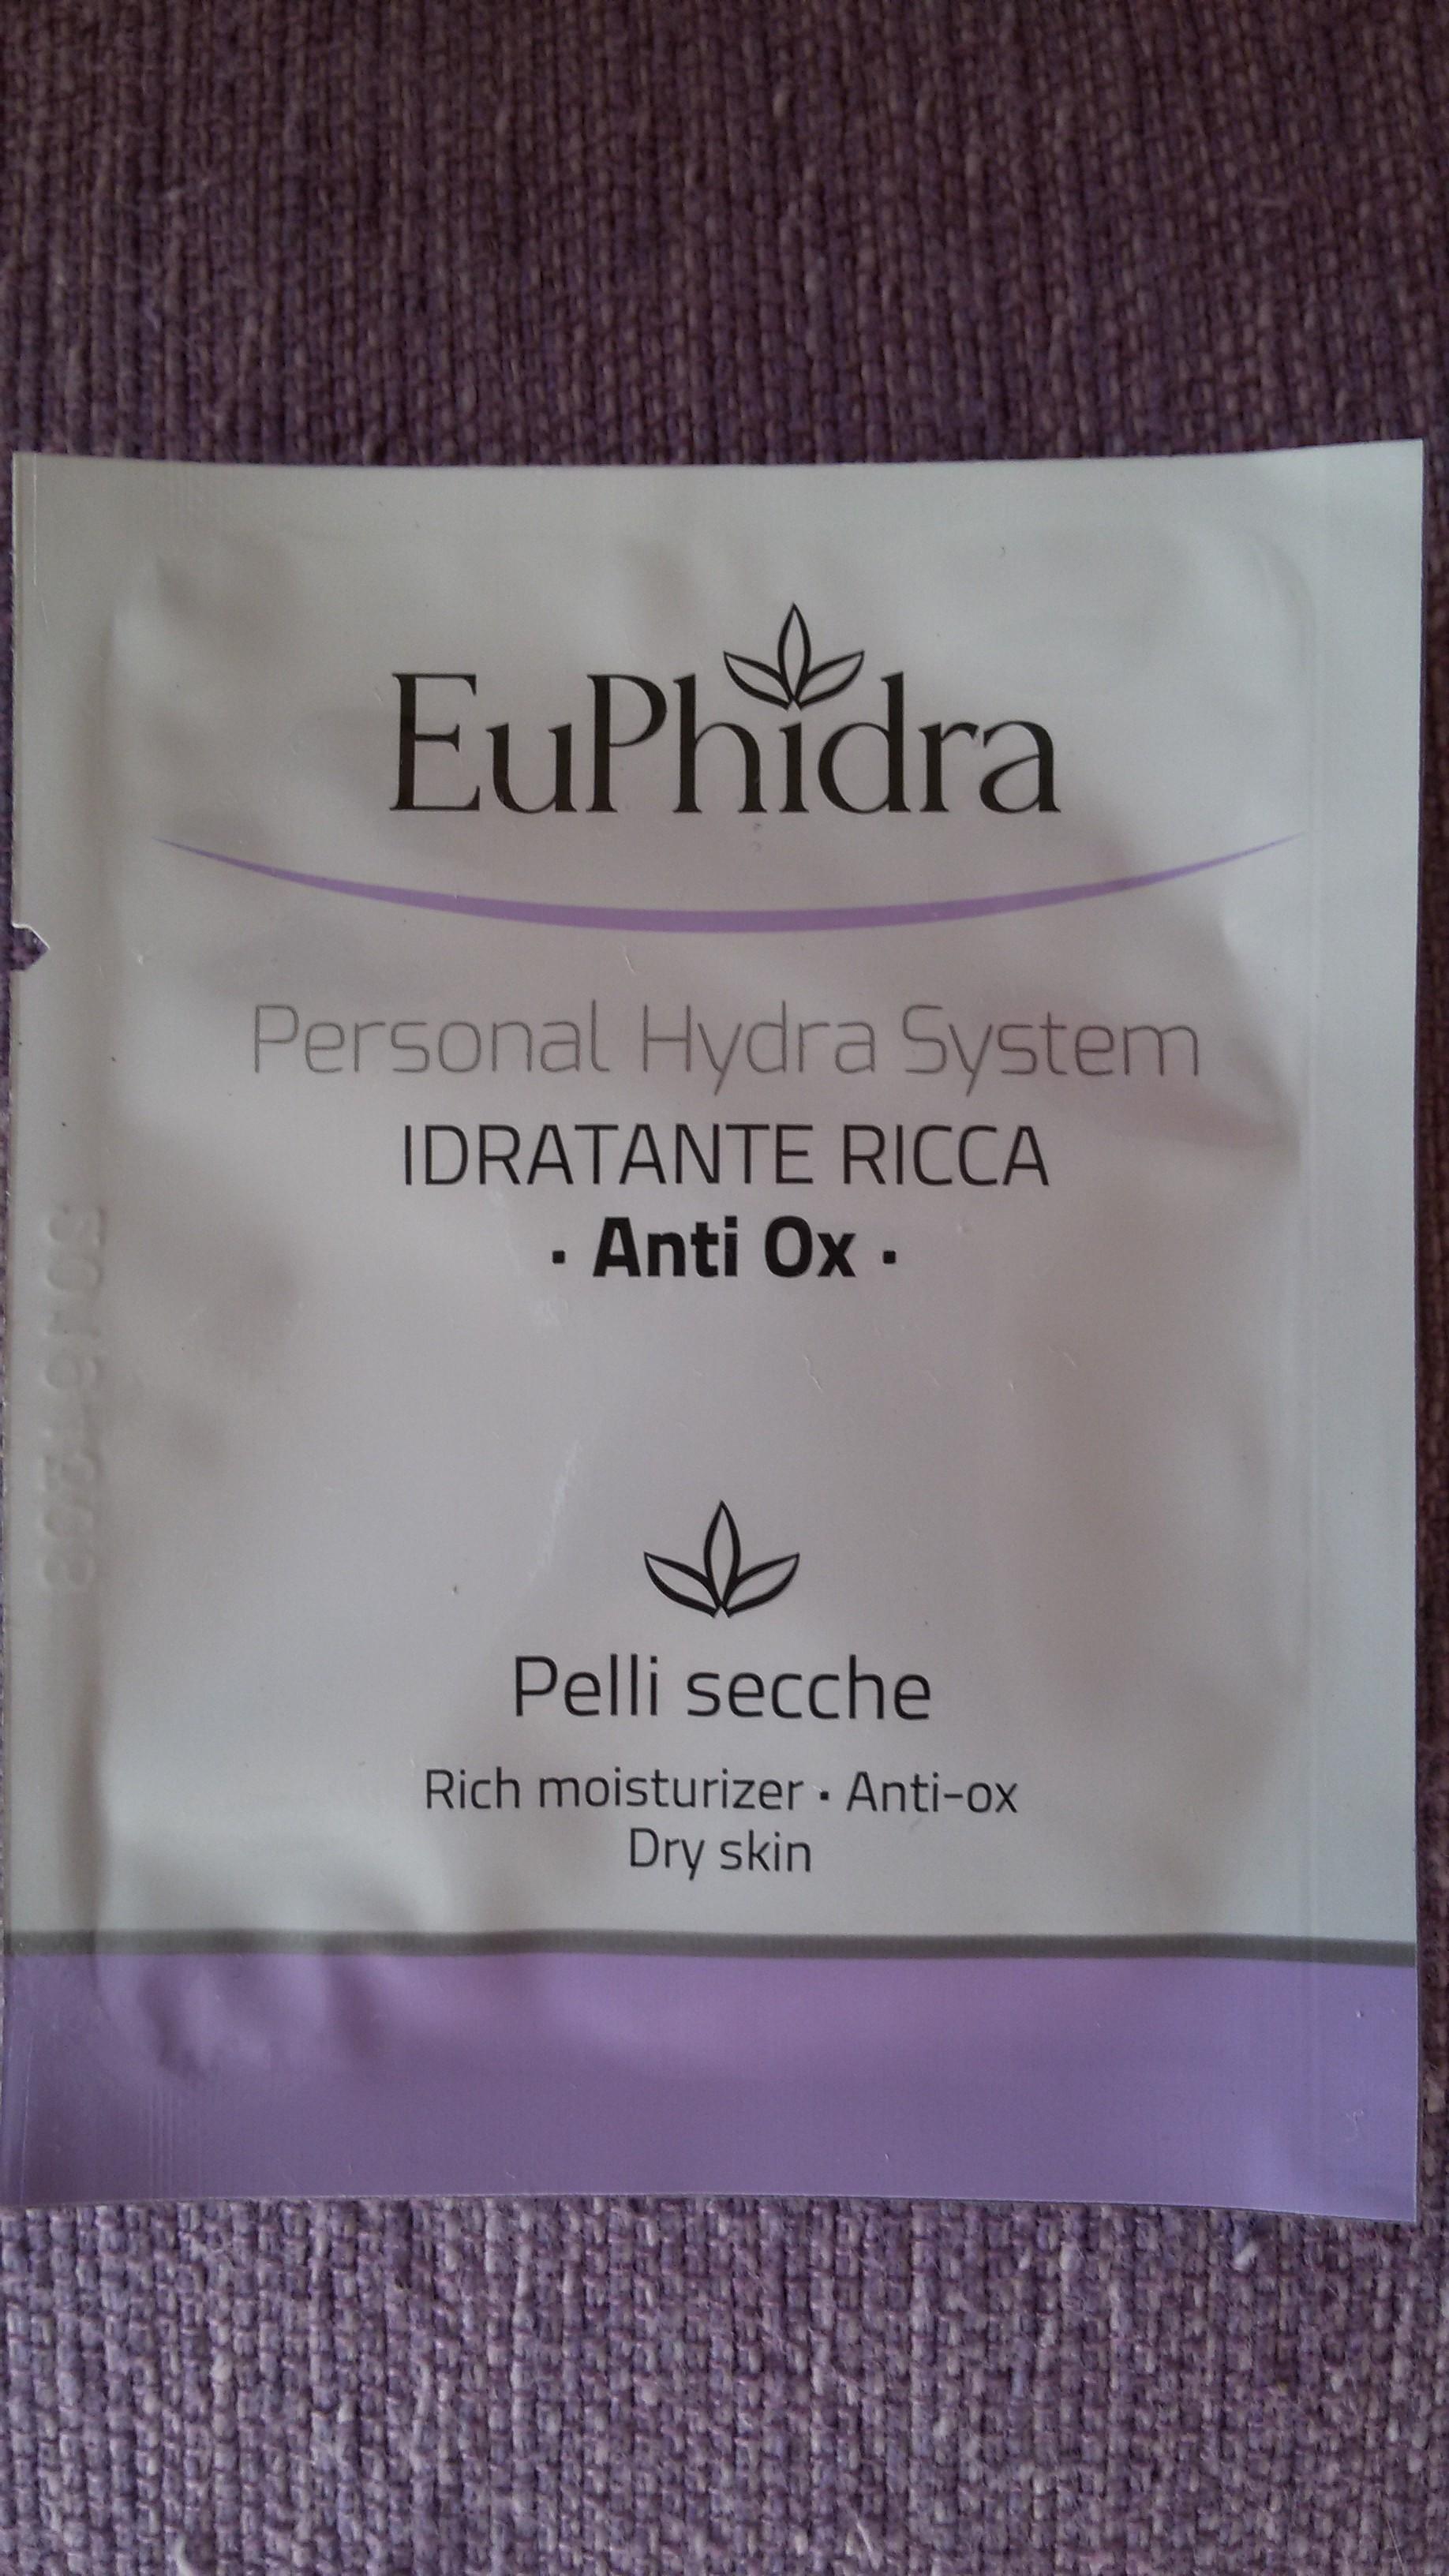 Euphidra Idratante ricca antiossidante, recensione Euphidra Idratante ricca antiossidante, opinione Euphidra Idratante ricca antiossidante